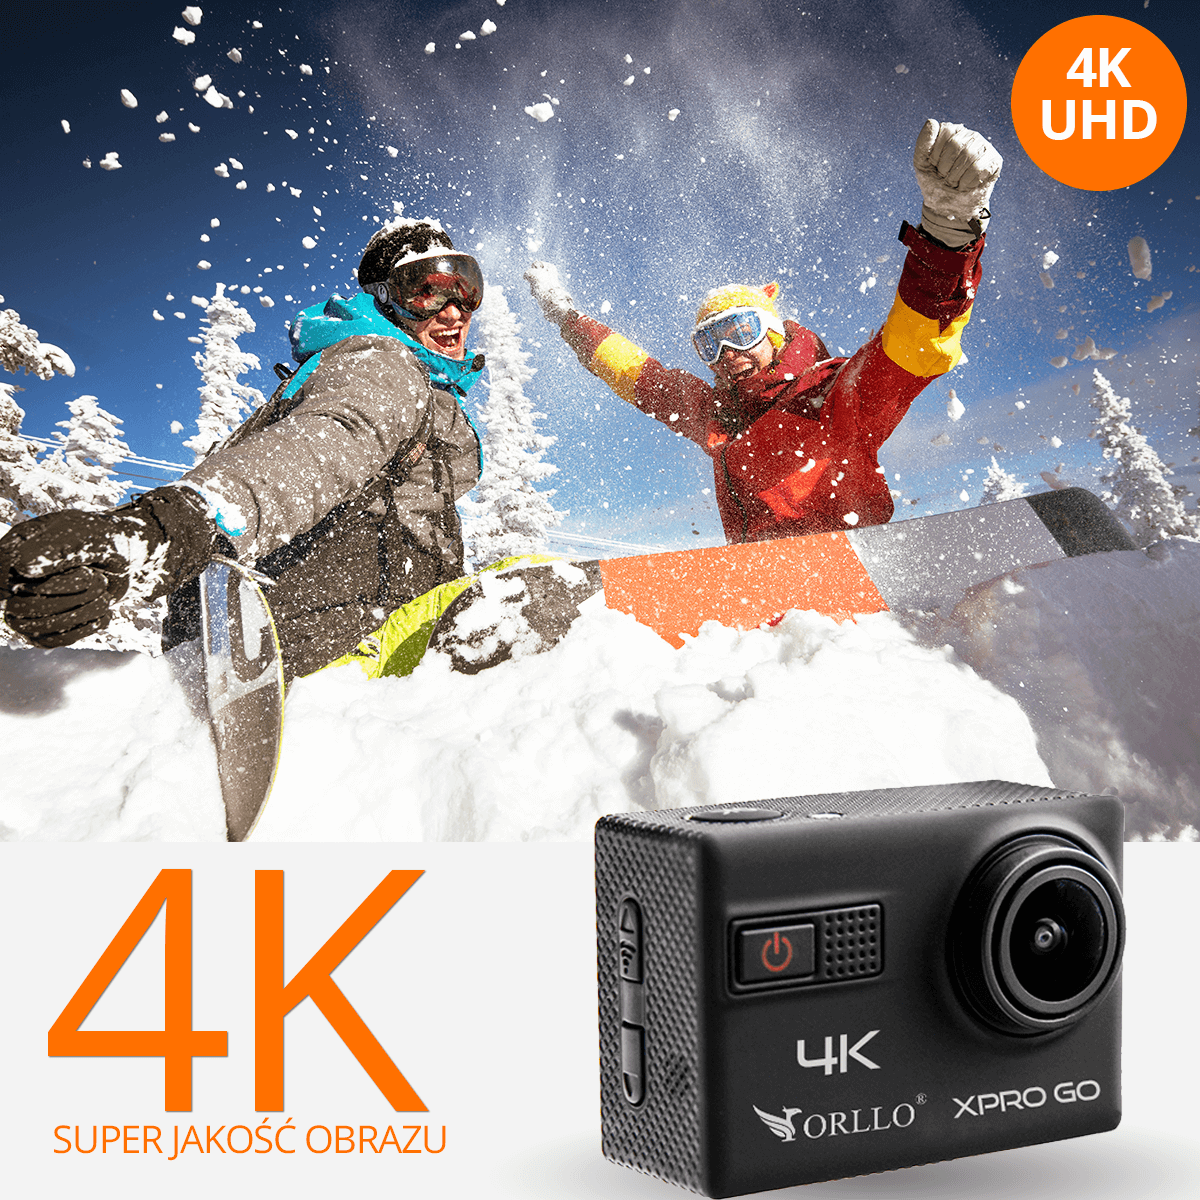 kamerka-sportowa-XPRO-Go-kamera-4k-orllo-pl